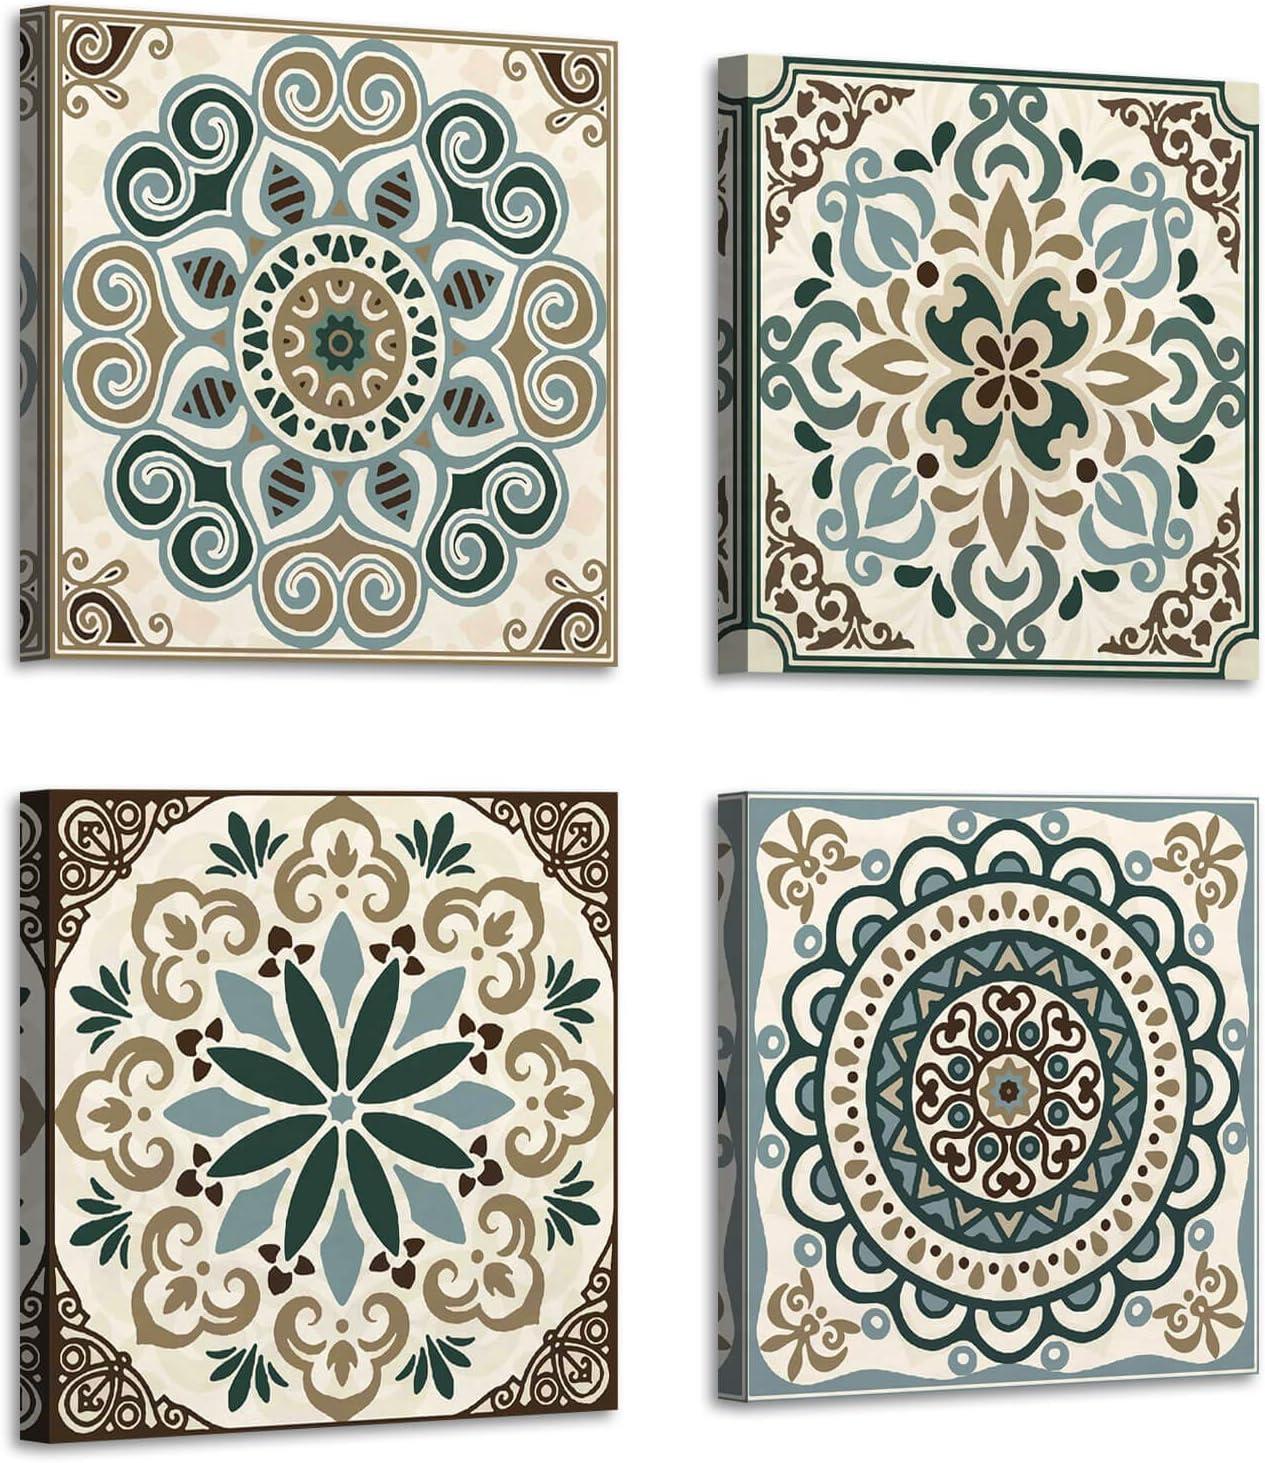 ARTISTIC PATH Bohemia Pattern 新作 大人気 Printing Art: Vintage Flower Wall クリアランスsale 期間限定